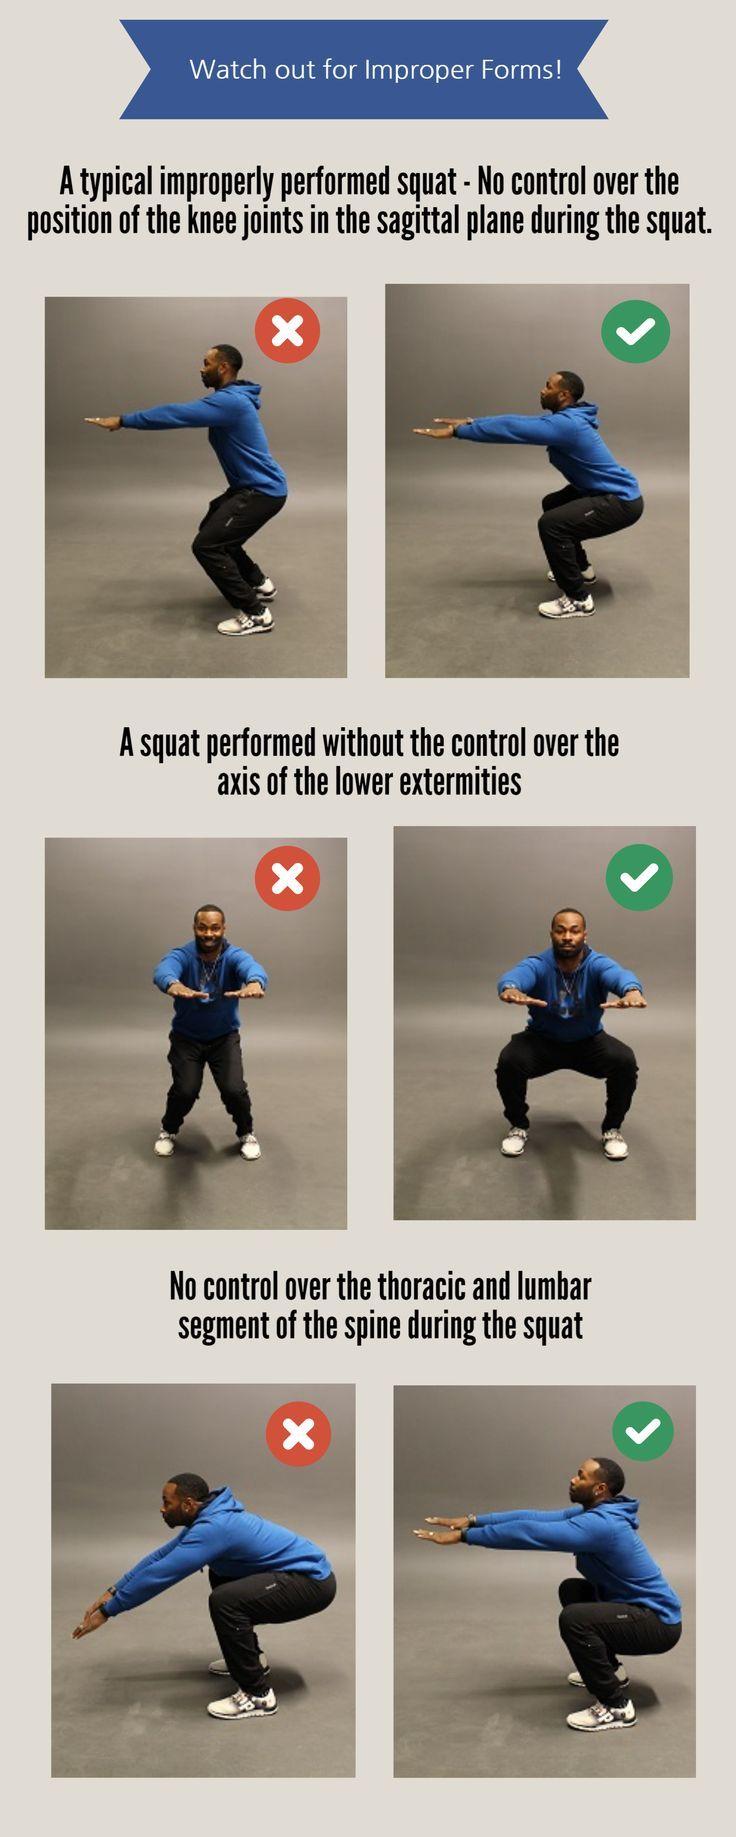 ItS Not Your Fault That You DonT Know Squat  Proper Squat